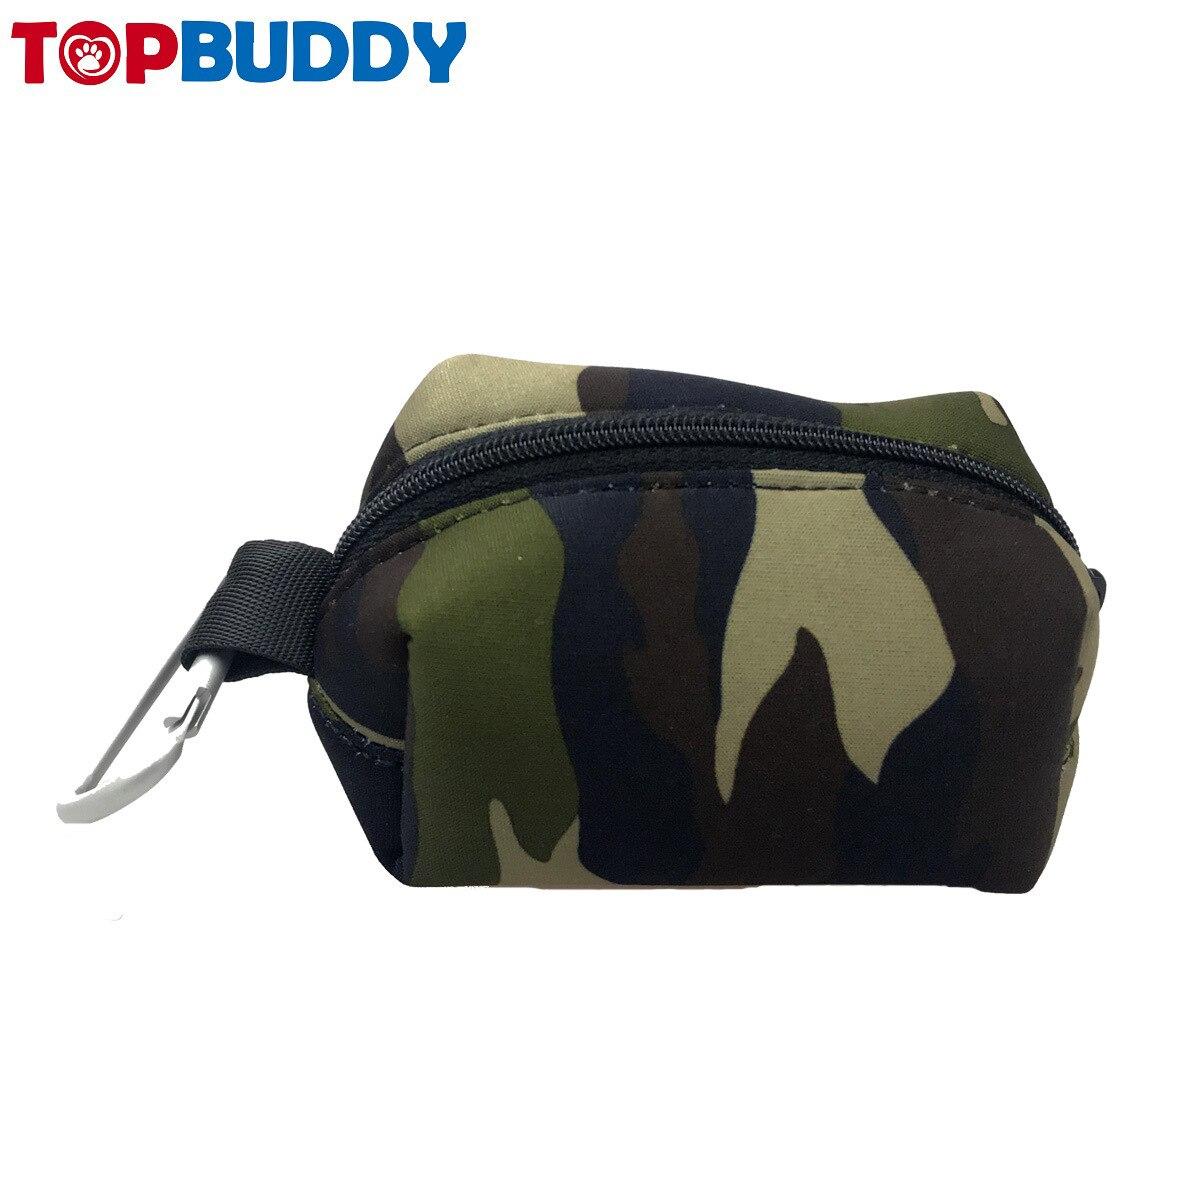 Pet Supplies Pet Camouflage Trash Pack Portable Sundry Bag Nursing Dog Training Ditty Bag Pet Snack Pack